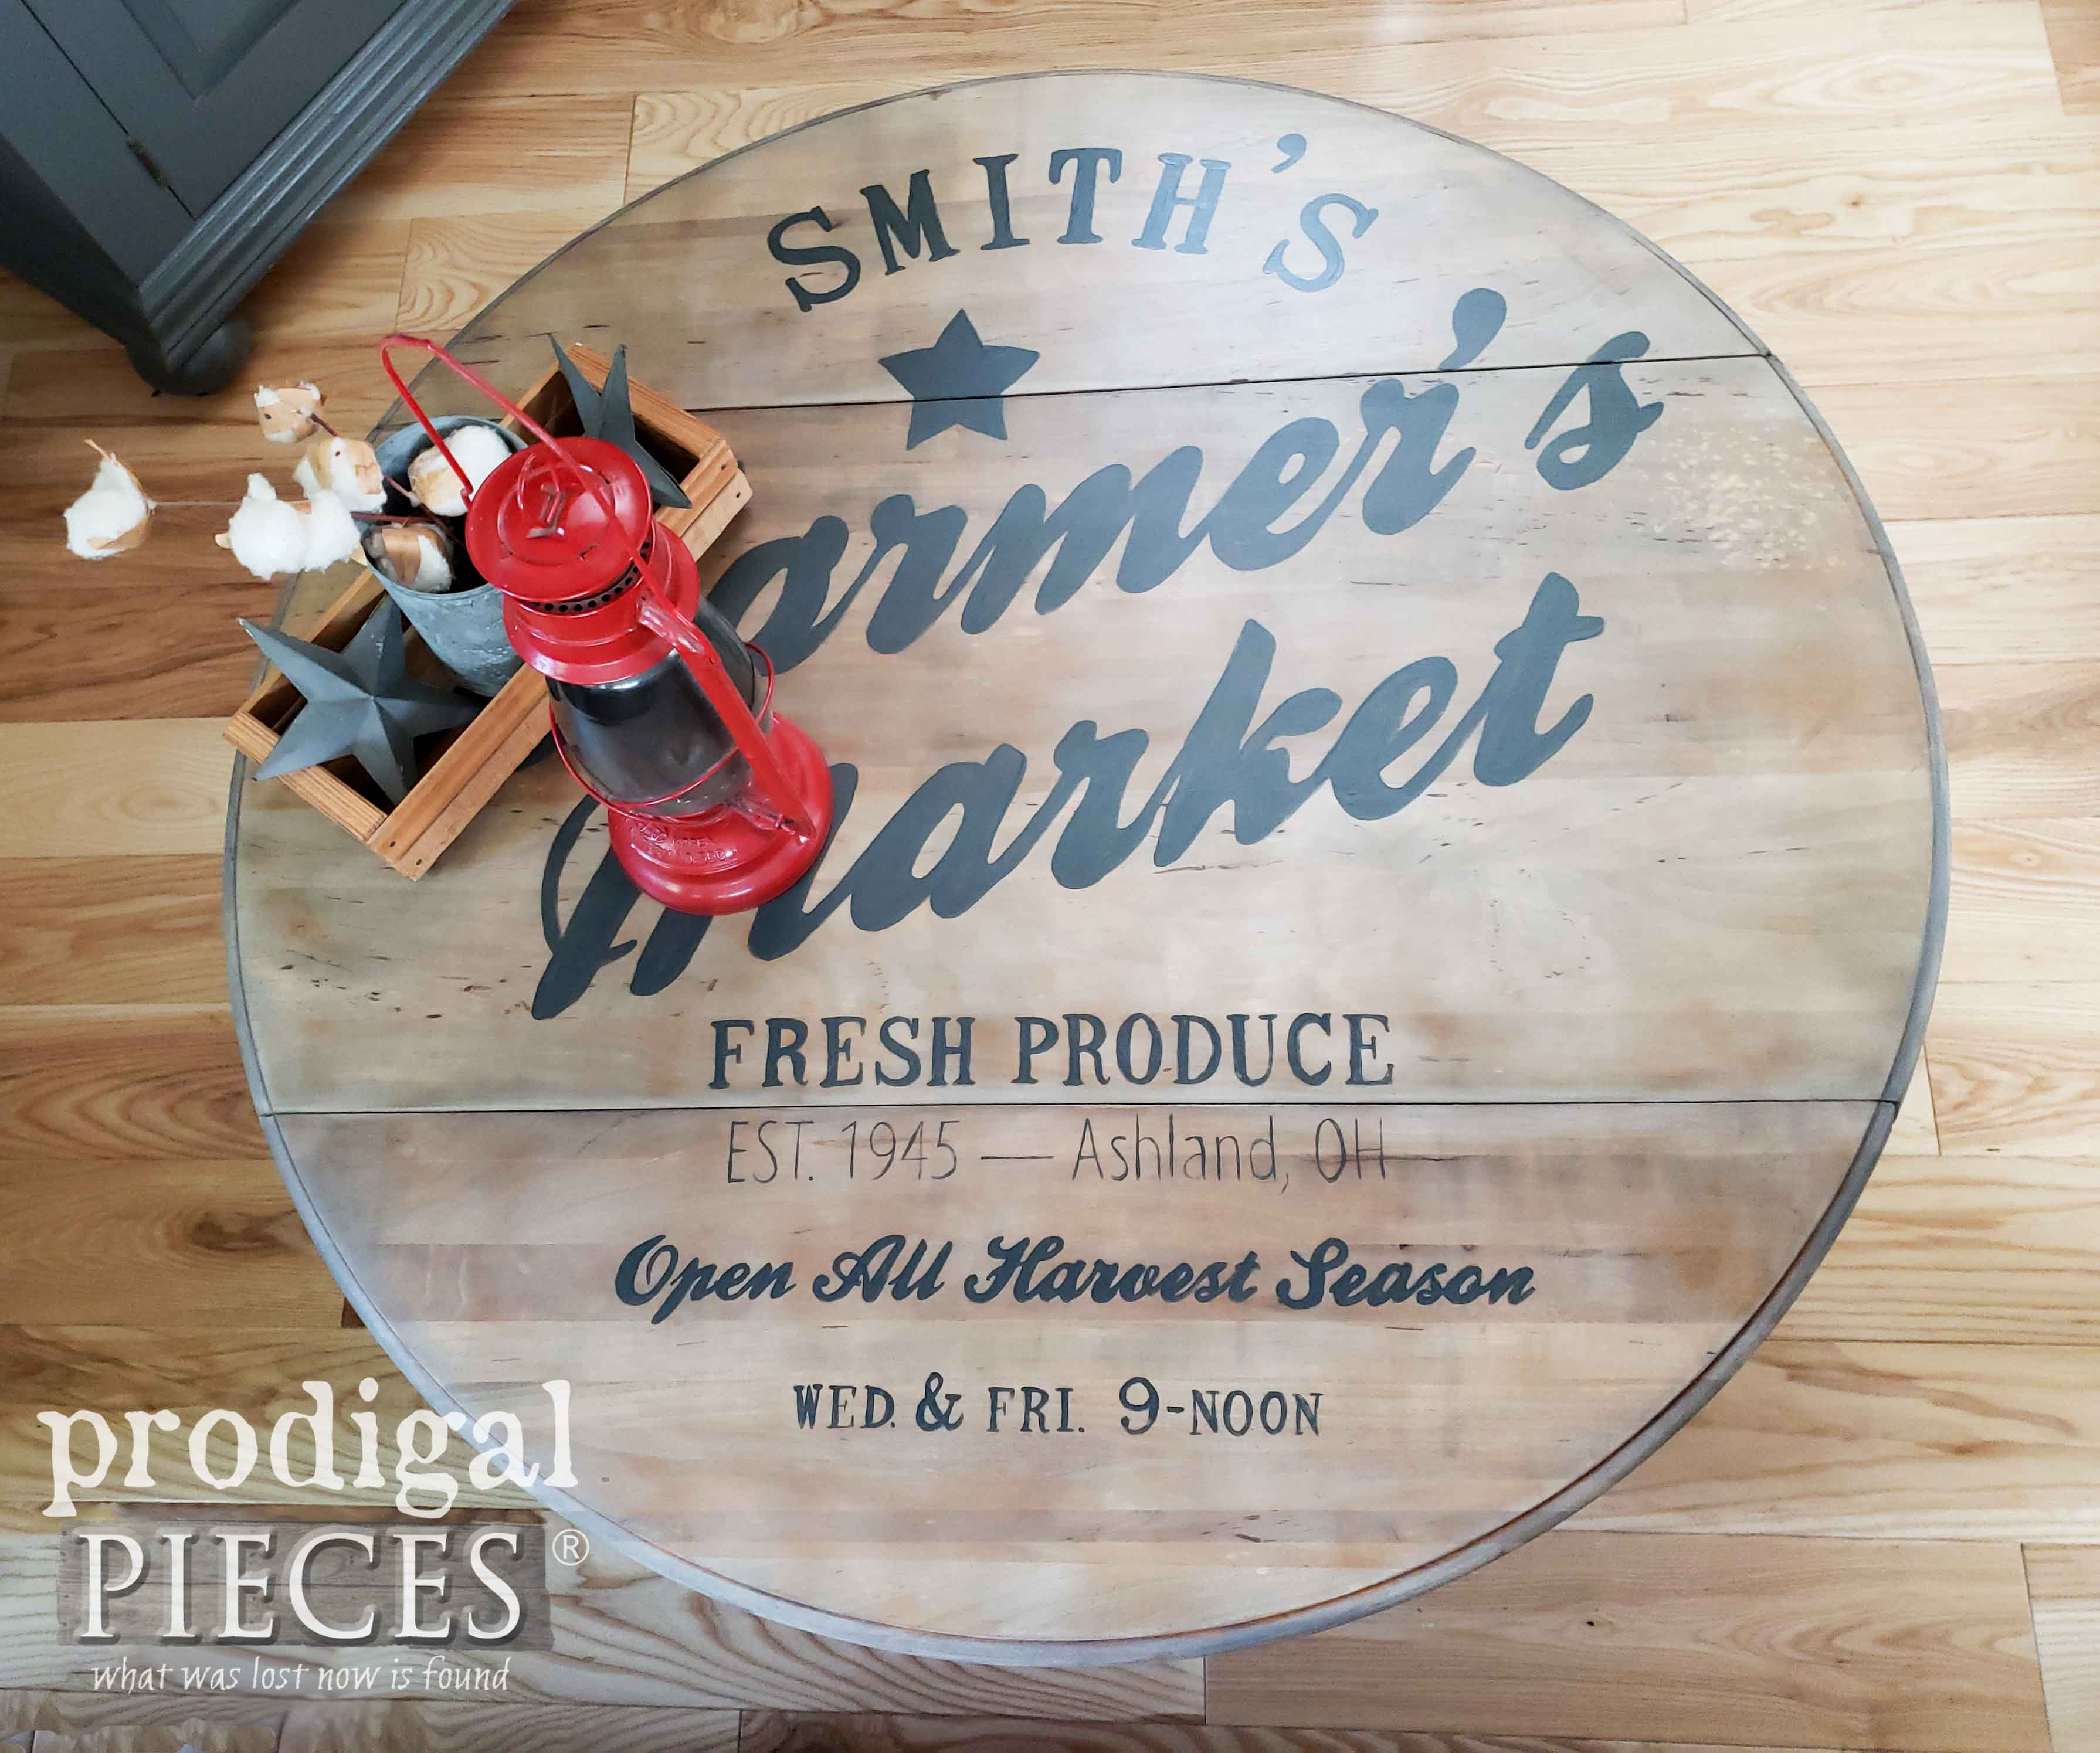 Handmade Vintage Typography Coffee Table by Larissa of Prodigal Pieces   prodigalpieces.com #prodigalpieces #handmade #diy #home #furniture #farmhouse #vintage #homedecor